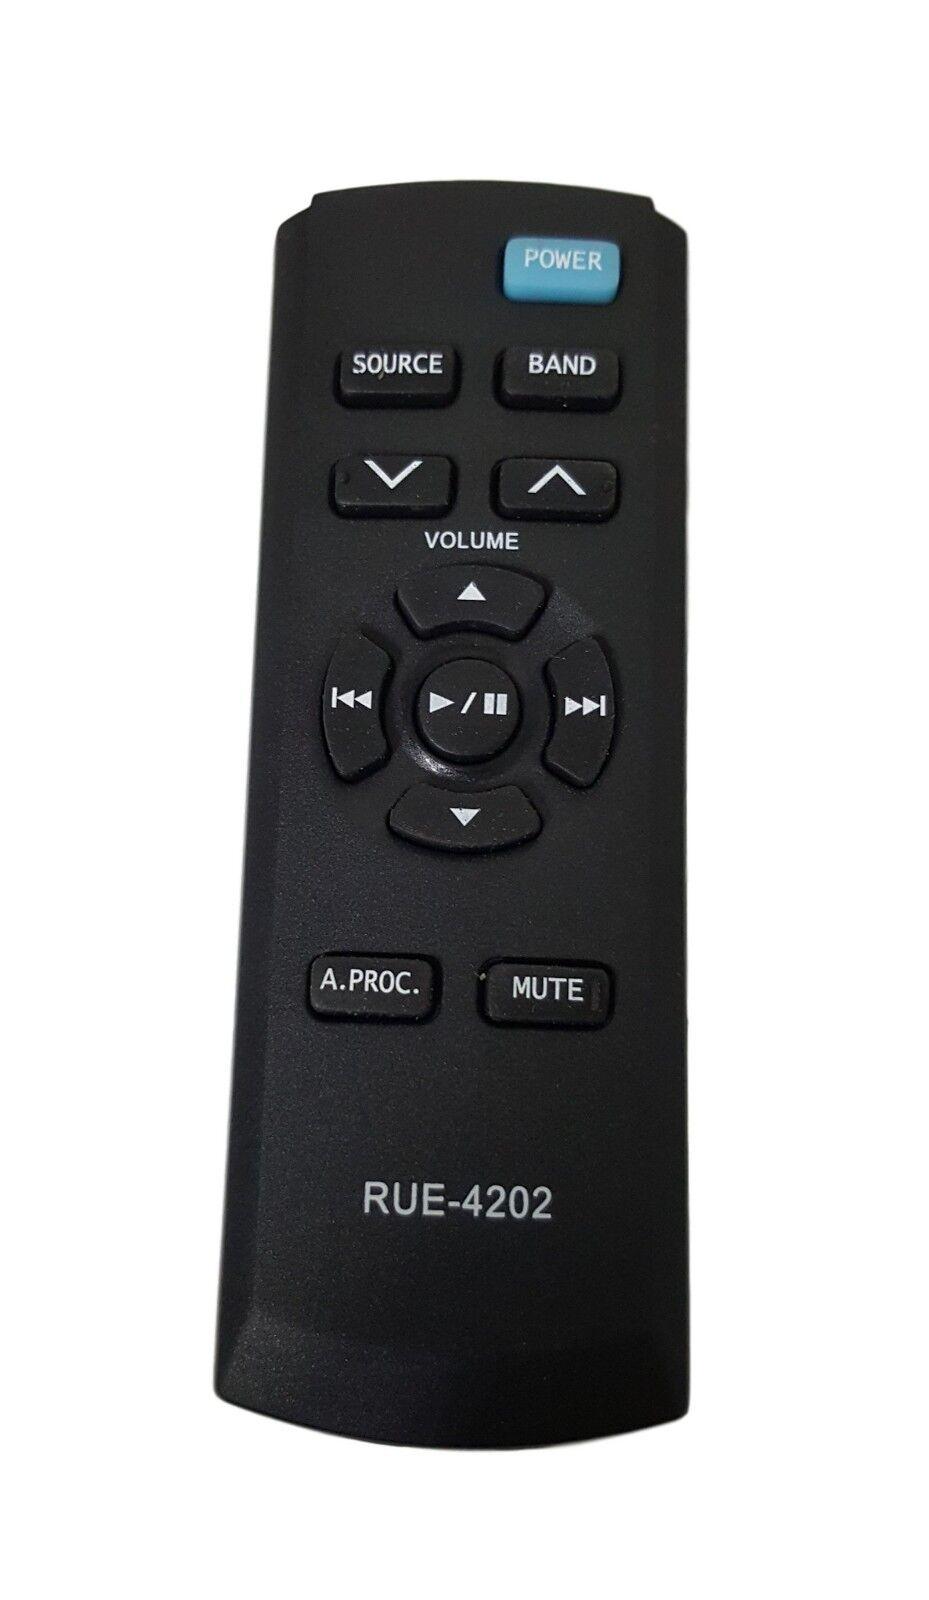 Alpine Rue 4202 Remote Control Genuine Original Oem E3 Ebay Jl Audio Xd Acs60 6 Gauge Amplifier Amp Wire Installation Kit Speaker Norton Secured Powered By Verisign